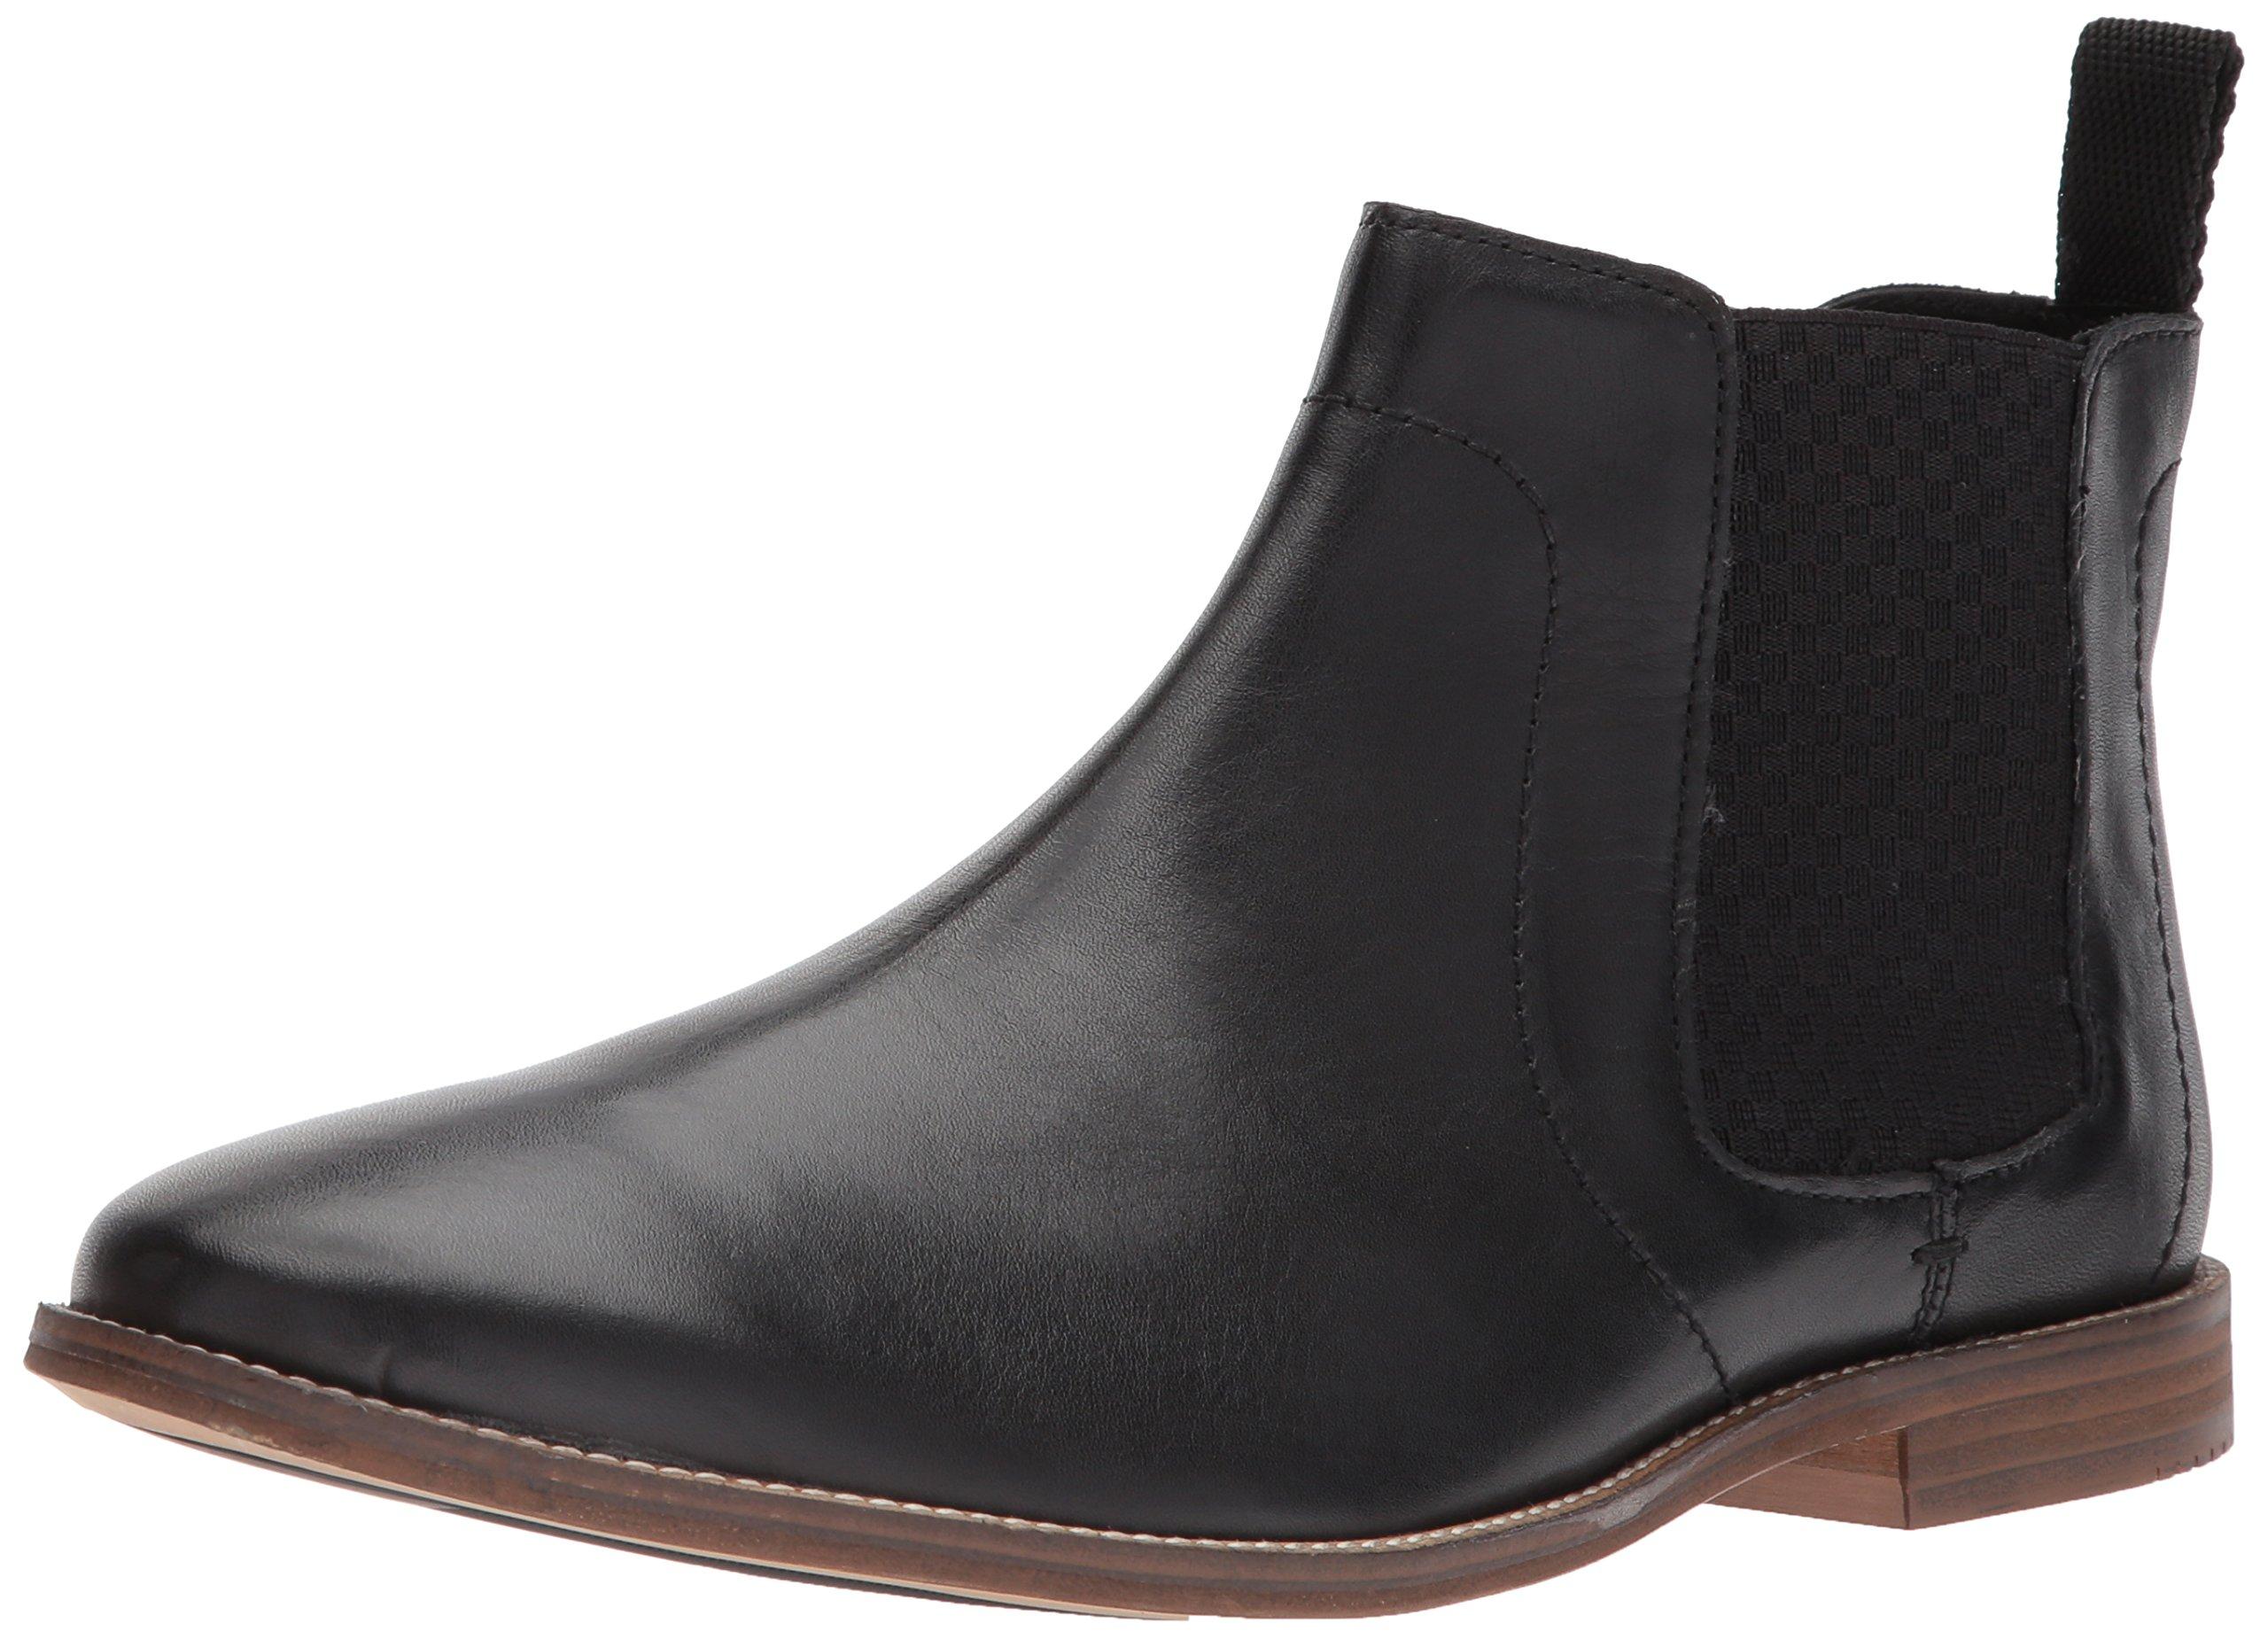 Ben Sherman Men's Gaston Chelsea Boot, Black-01A, 11 M US